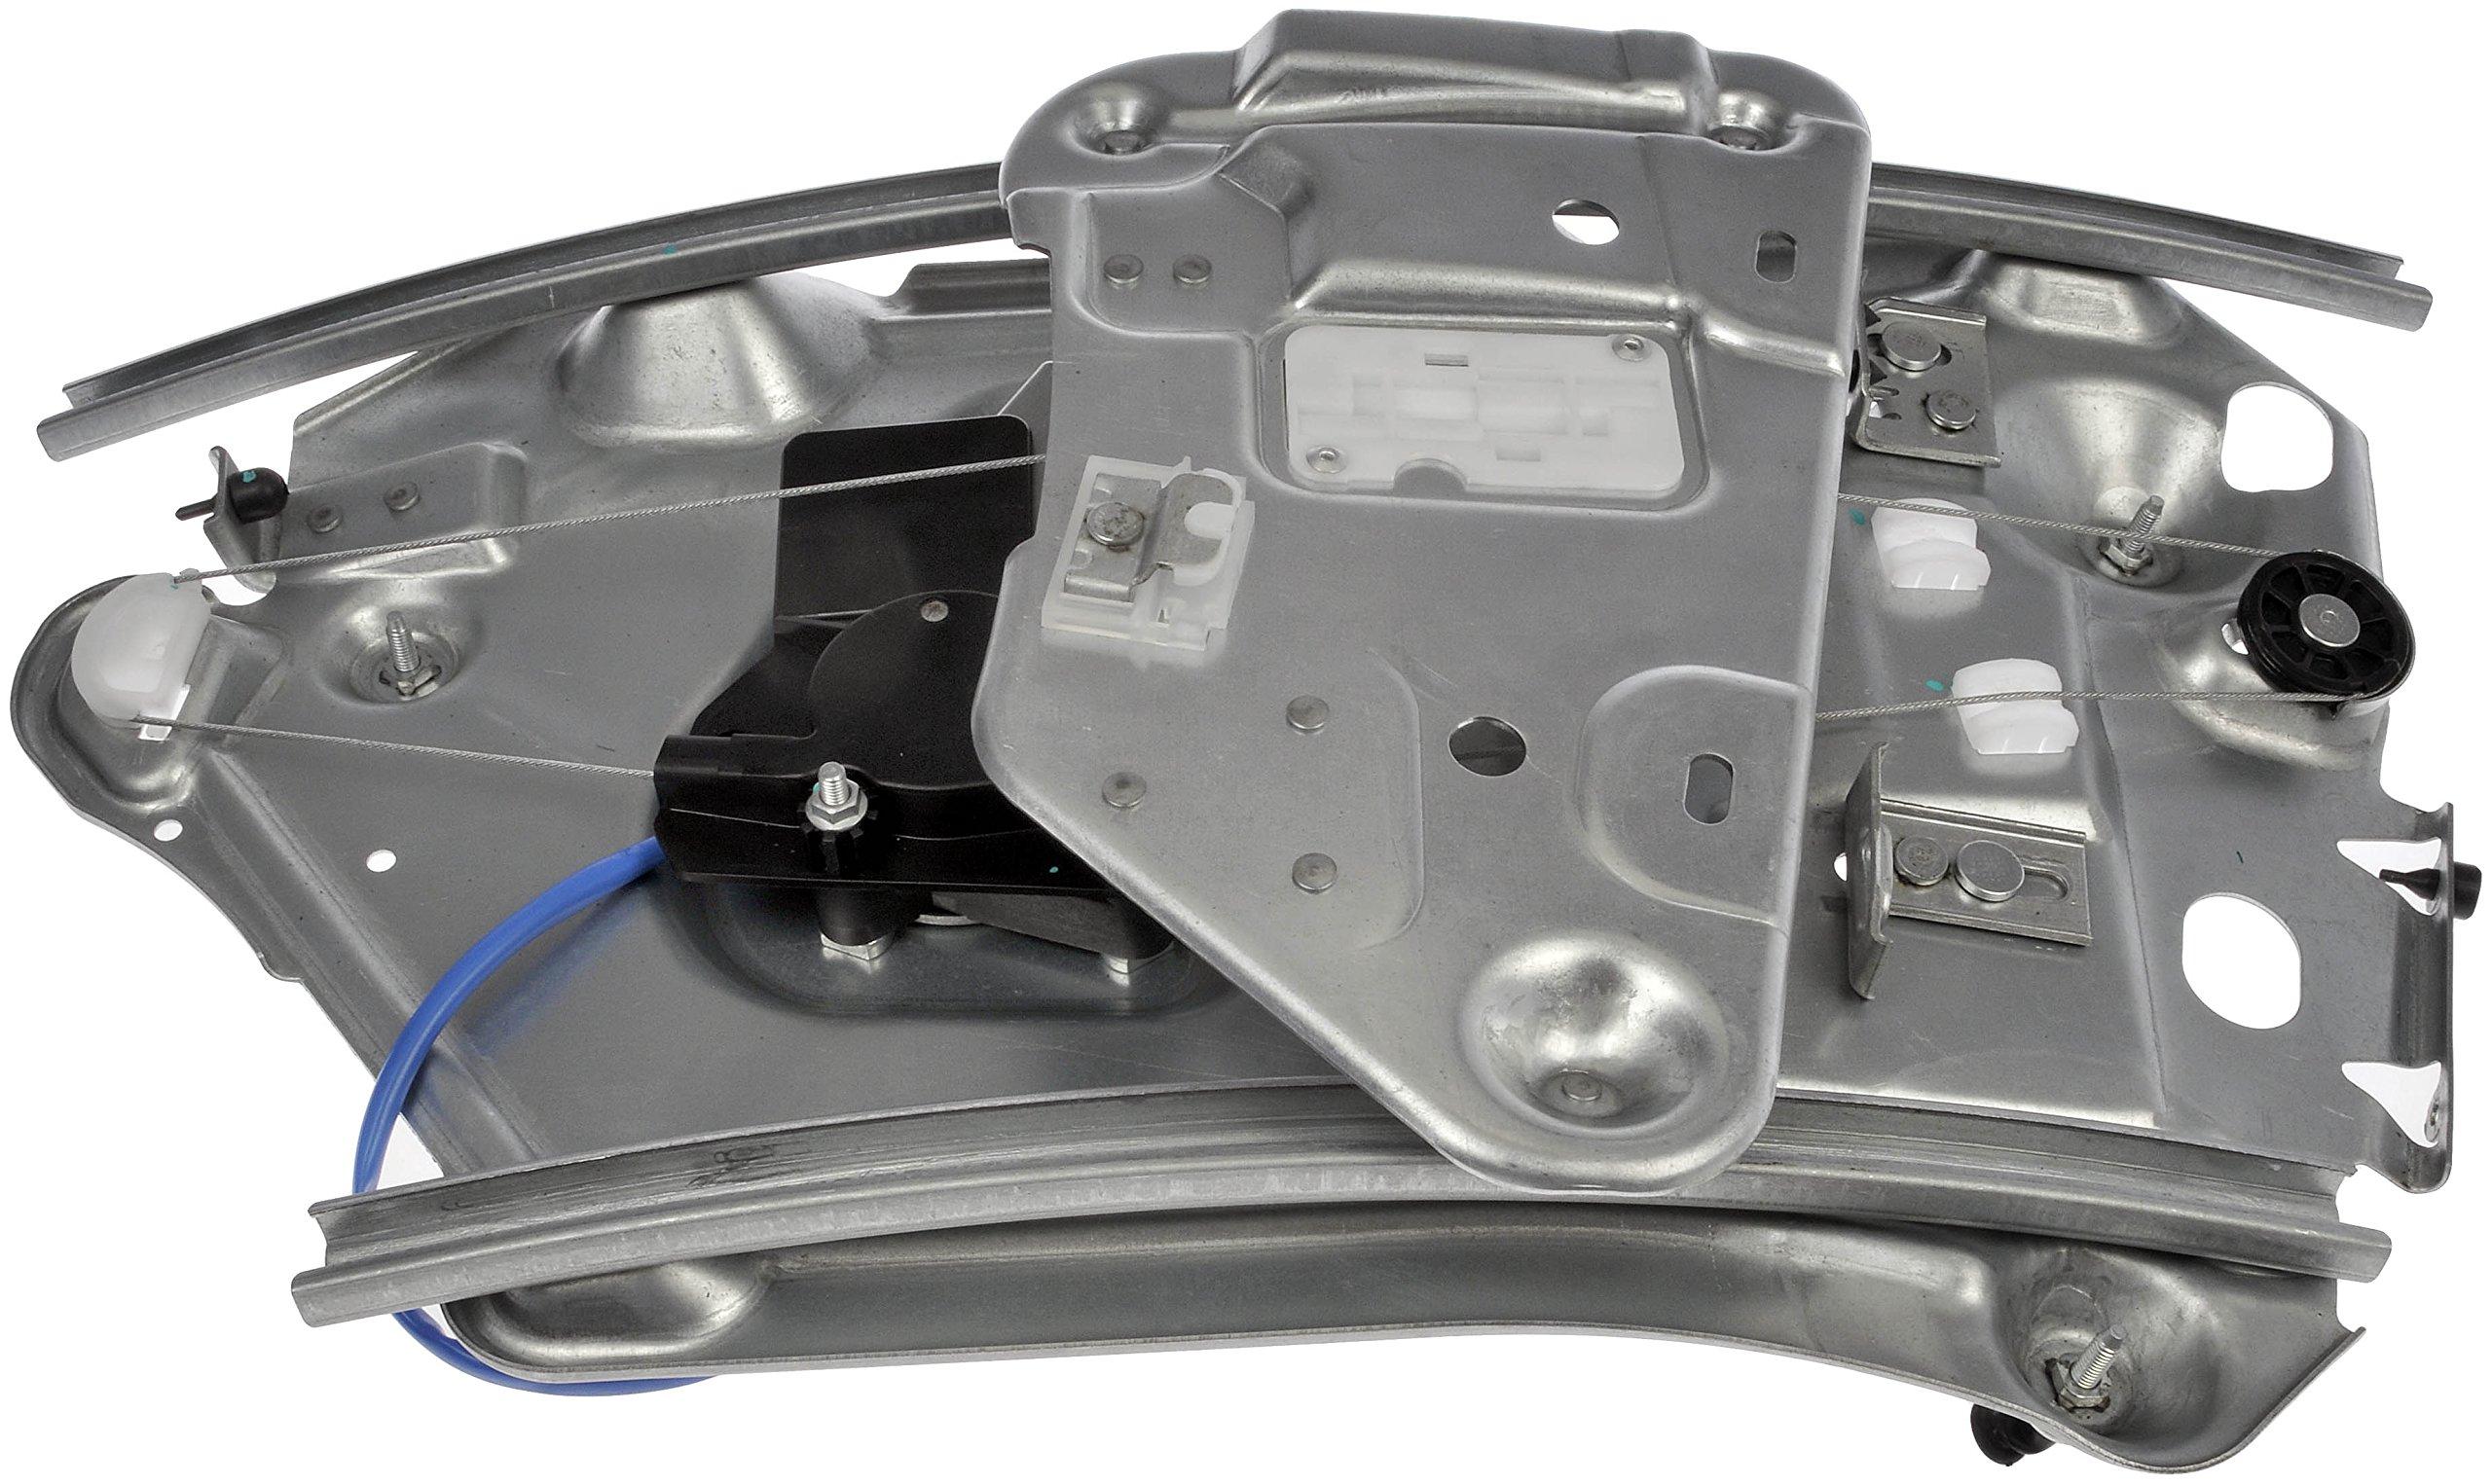 Dorman 751-284 Rear Driver Side Power Window Regulator and Motor Assembly for Select Chrysler Models by Dorman